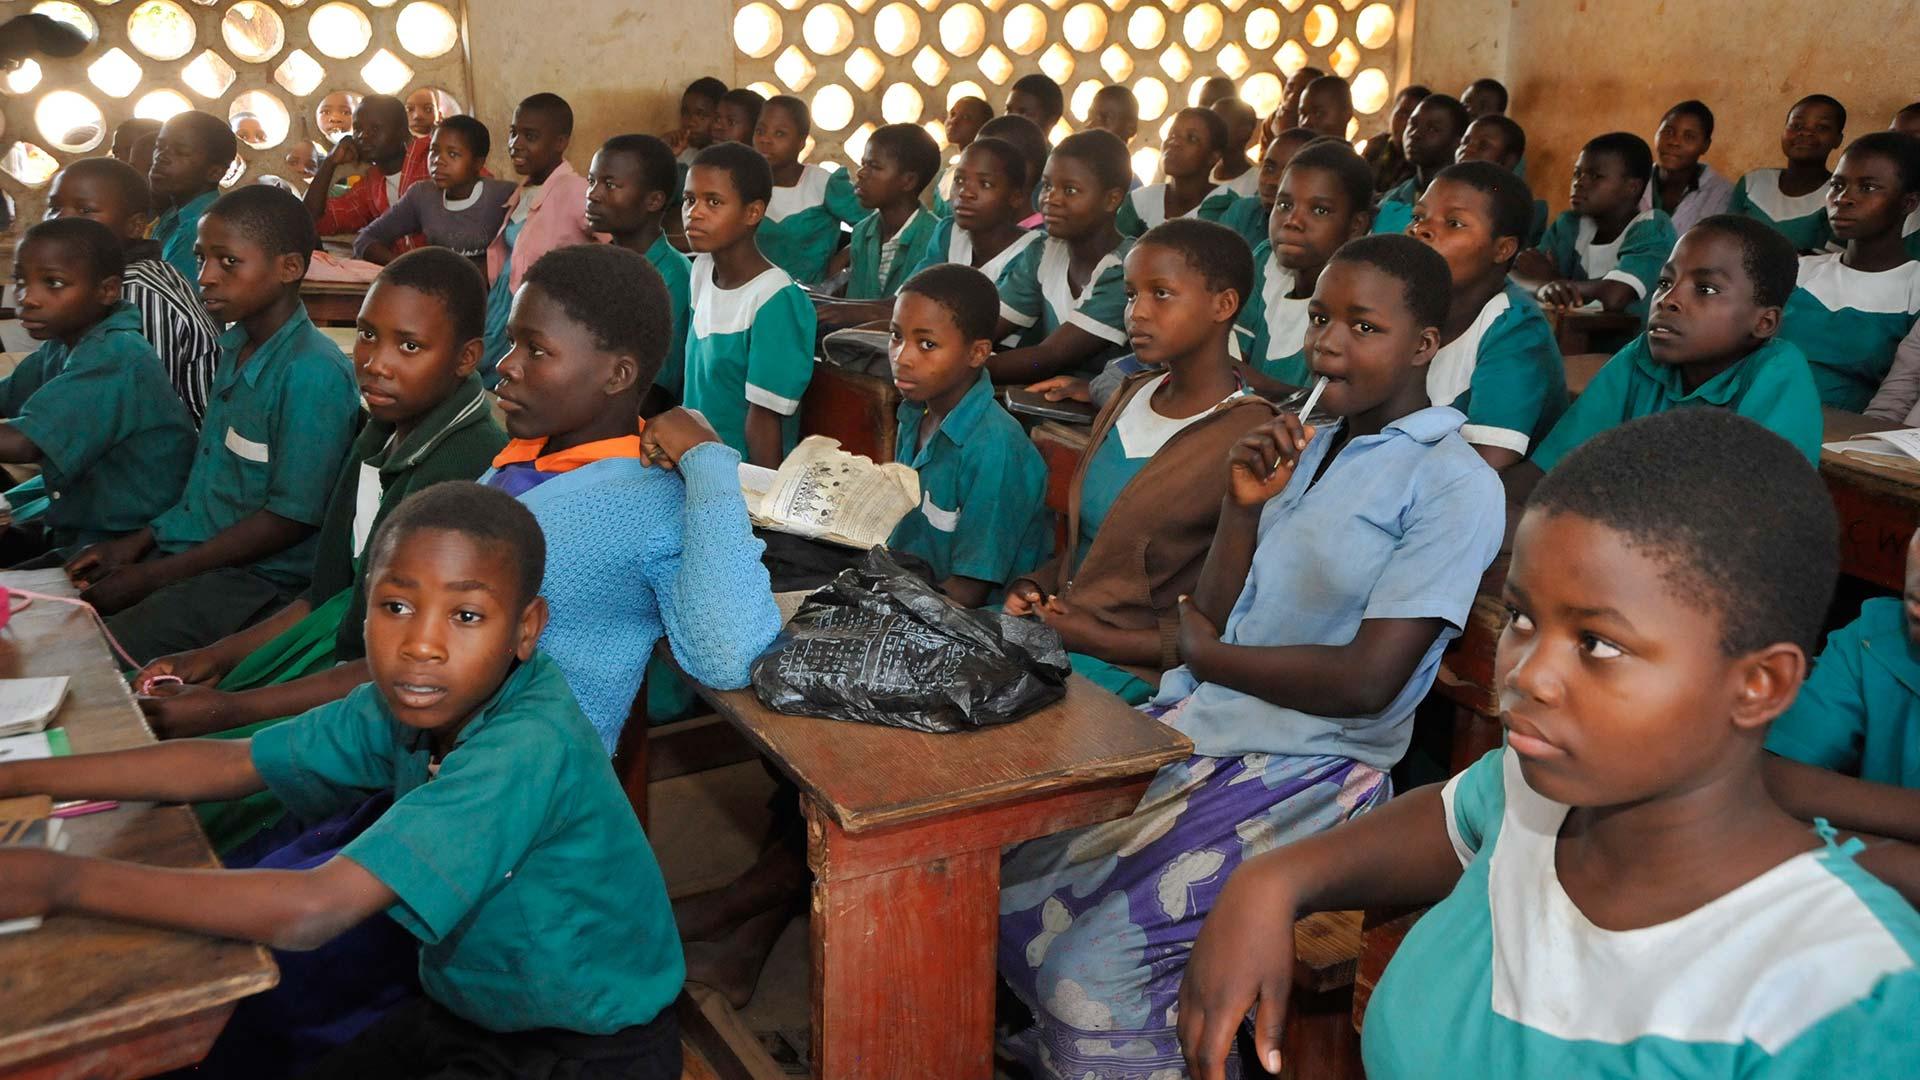 Classroom full of Malawian school children at their desks